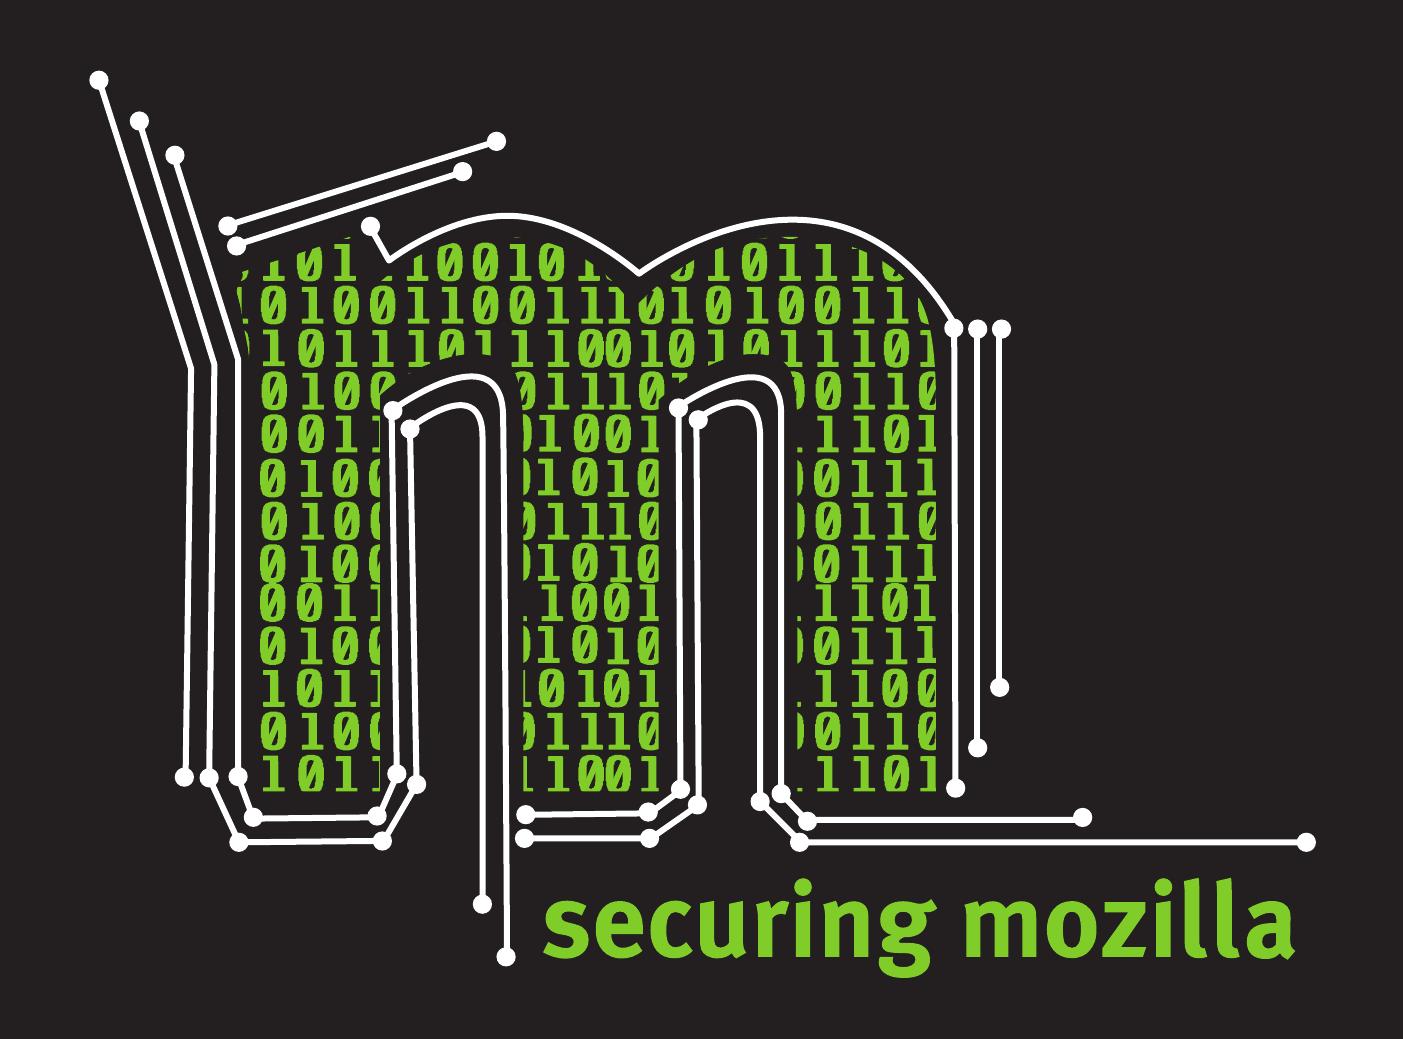 MIG (Mozilla InvestiGator)